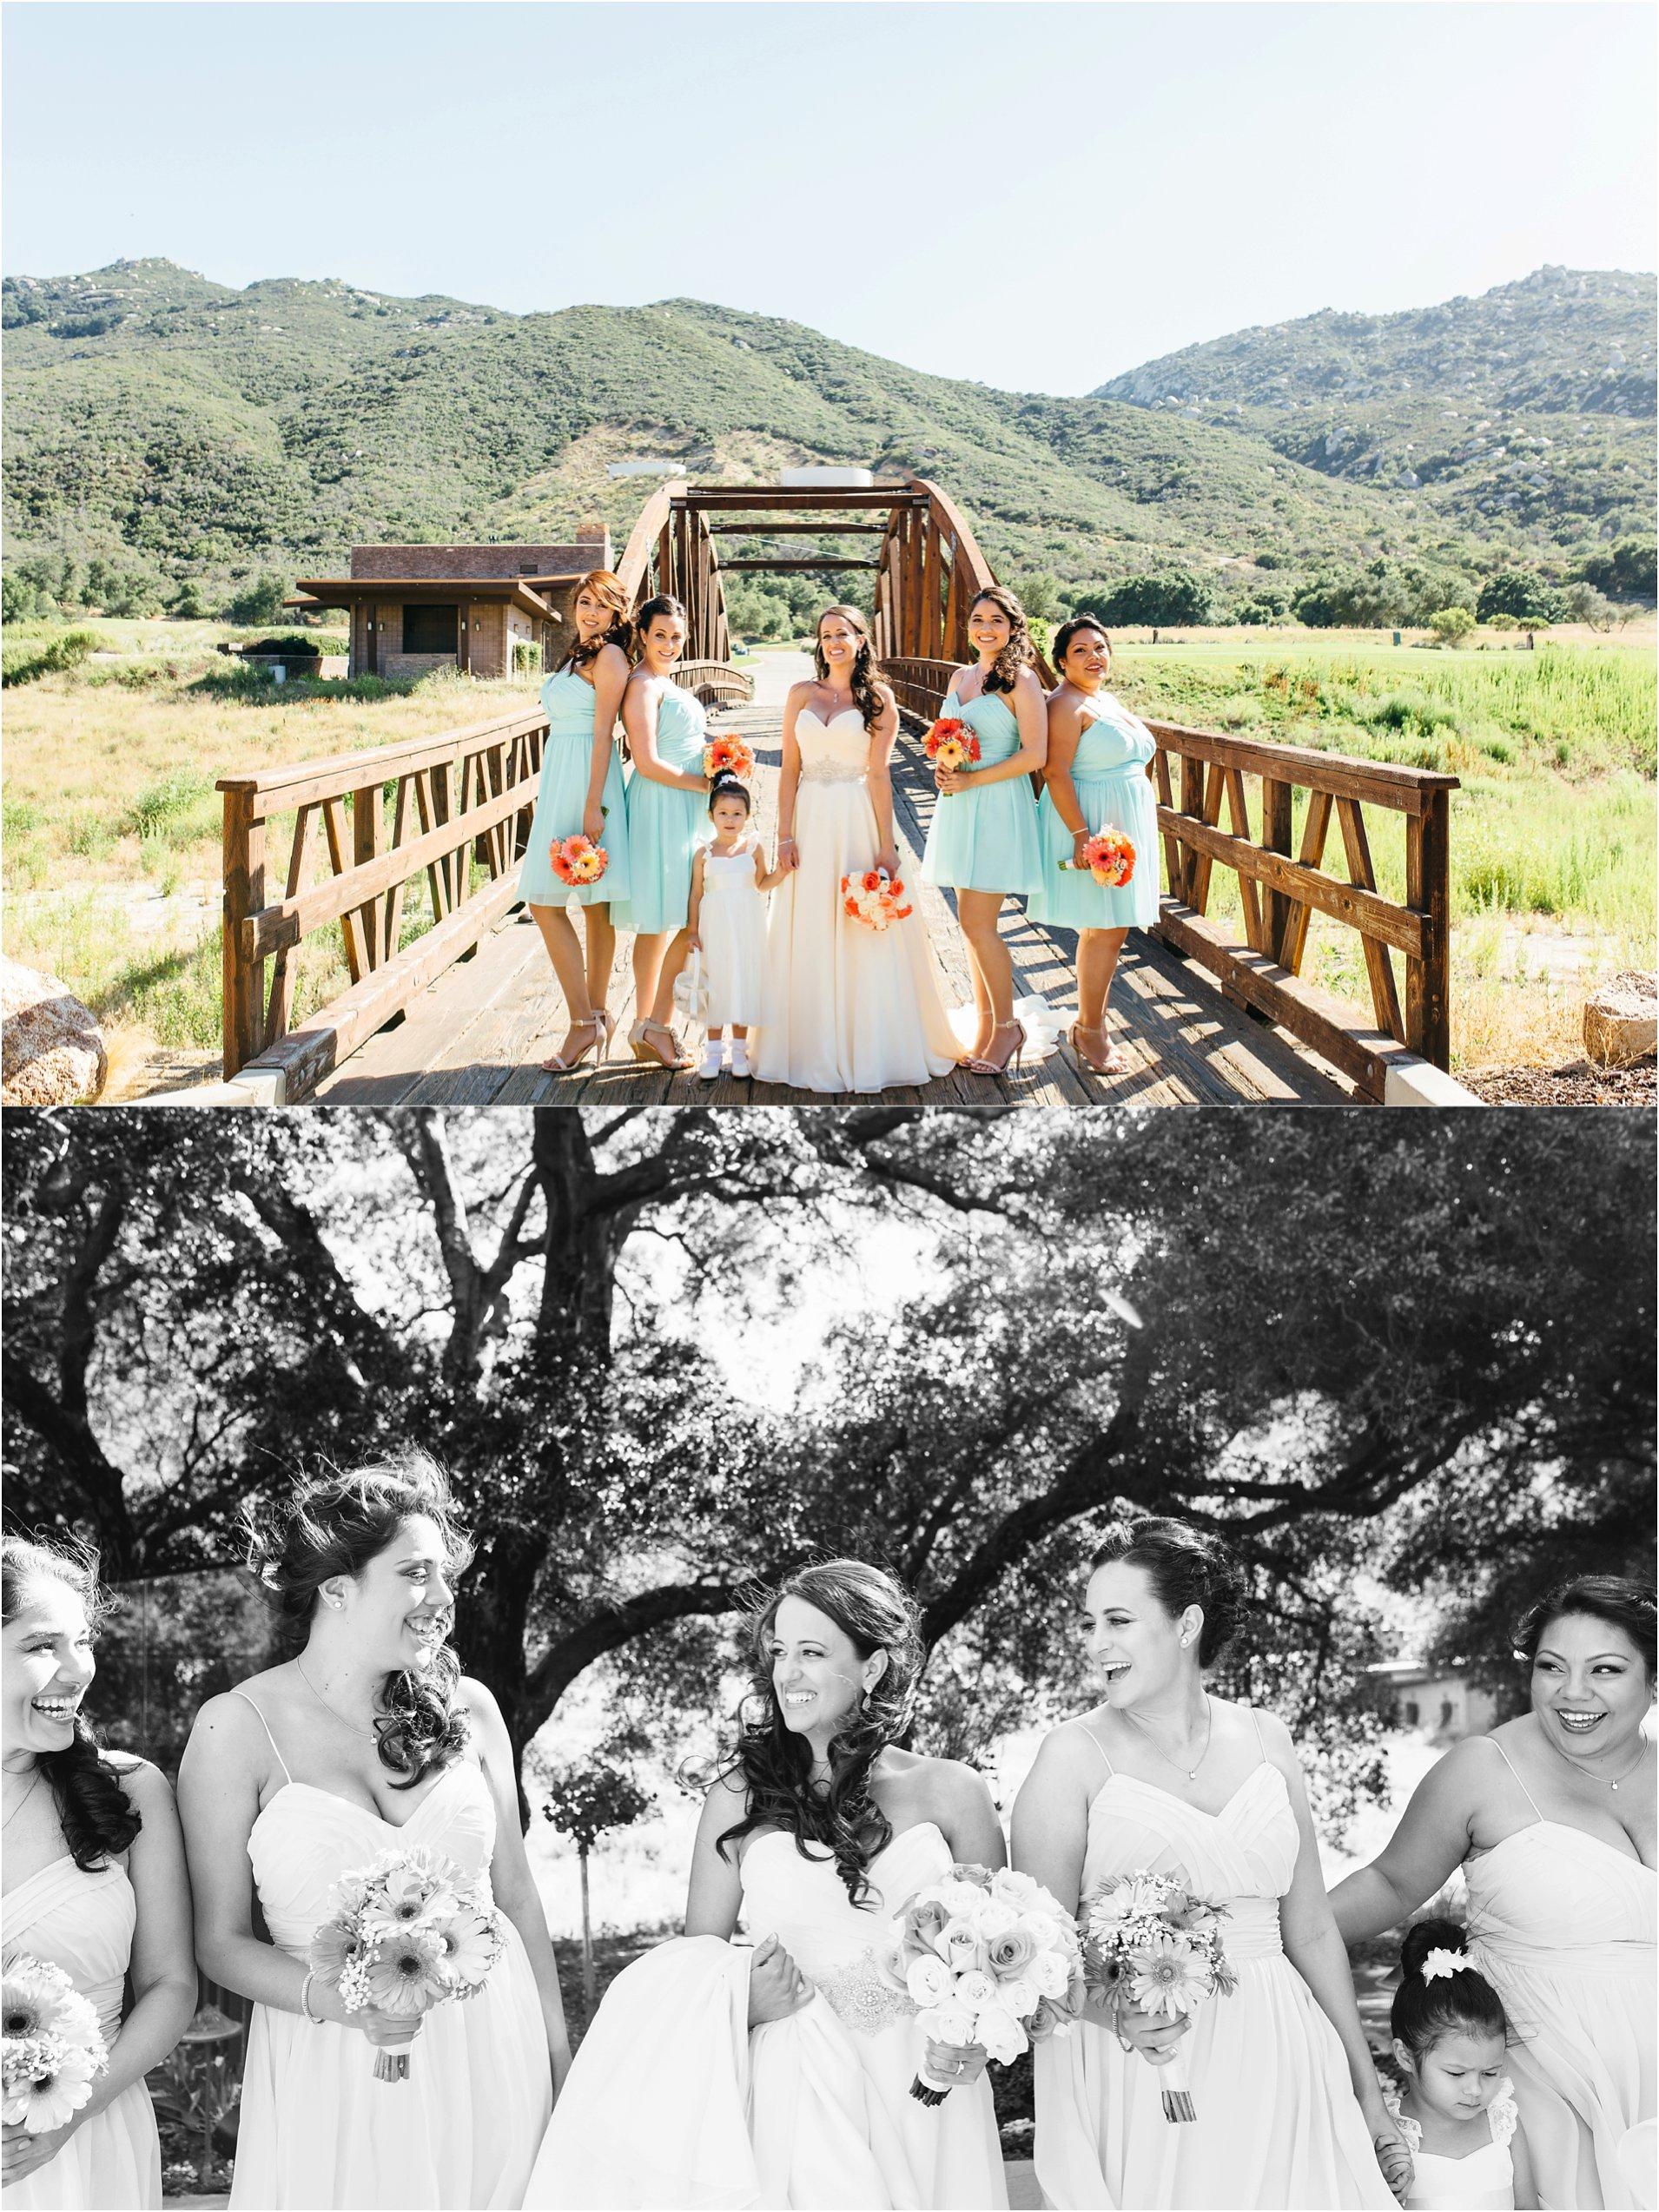 bride and bridesmaids photos at journey's end at pechanga casino